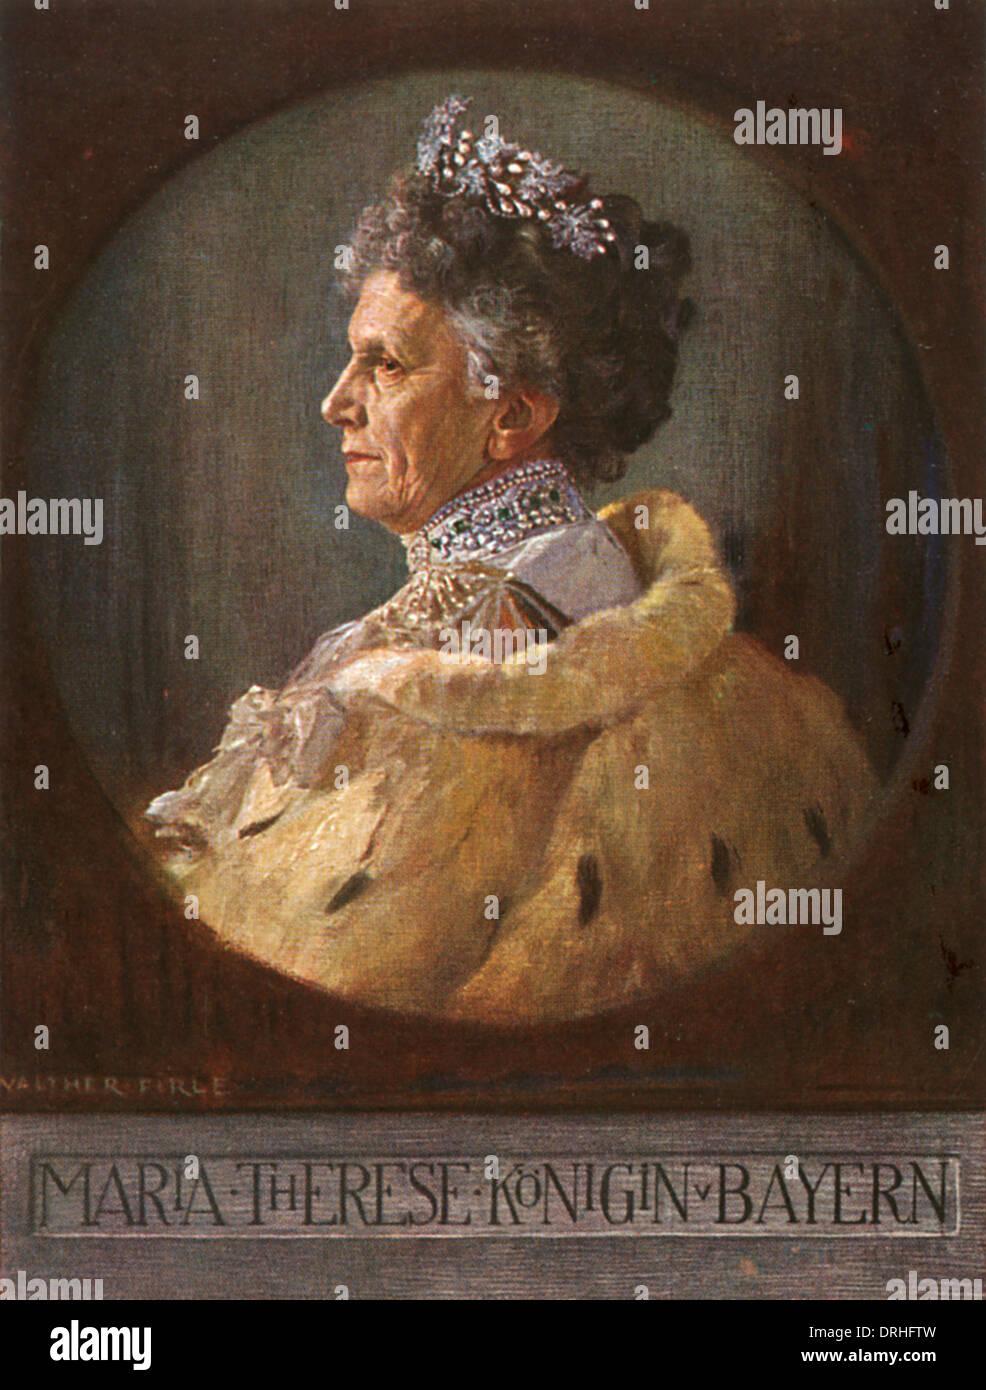 Maria Theresa of Austria Este Queen Consort of